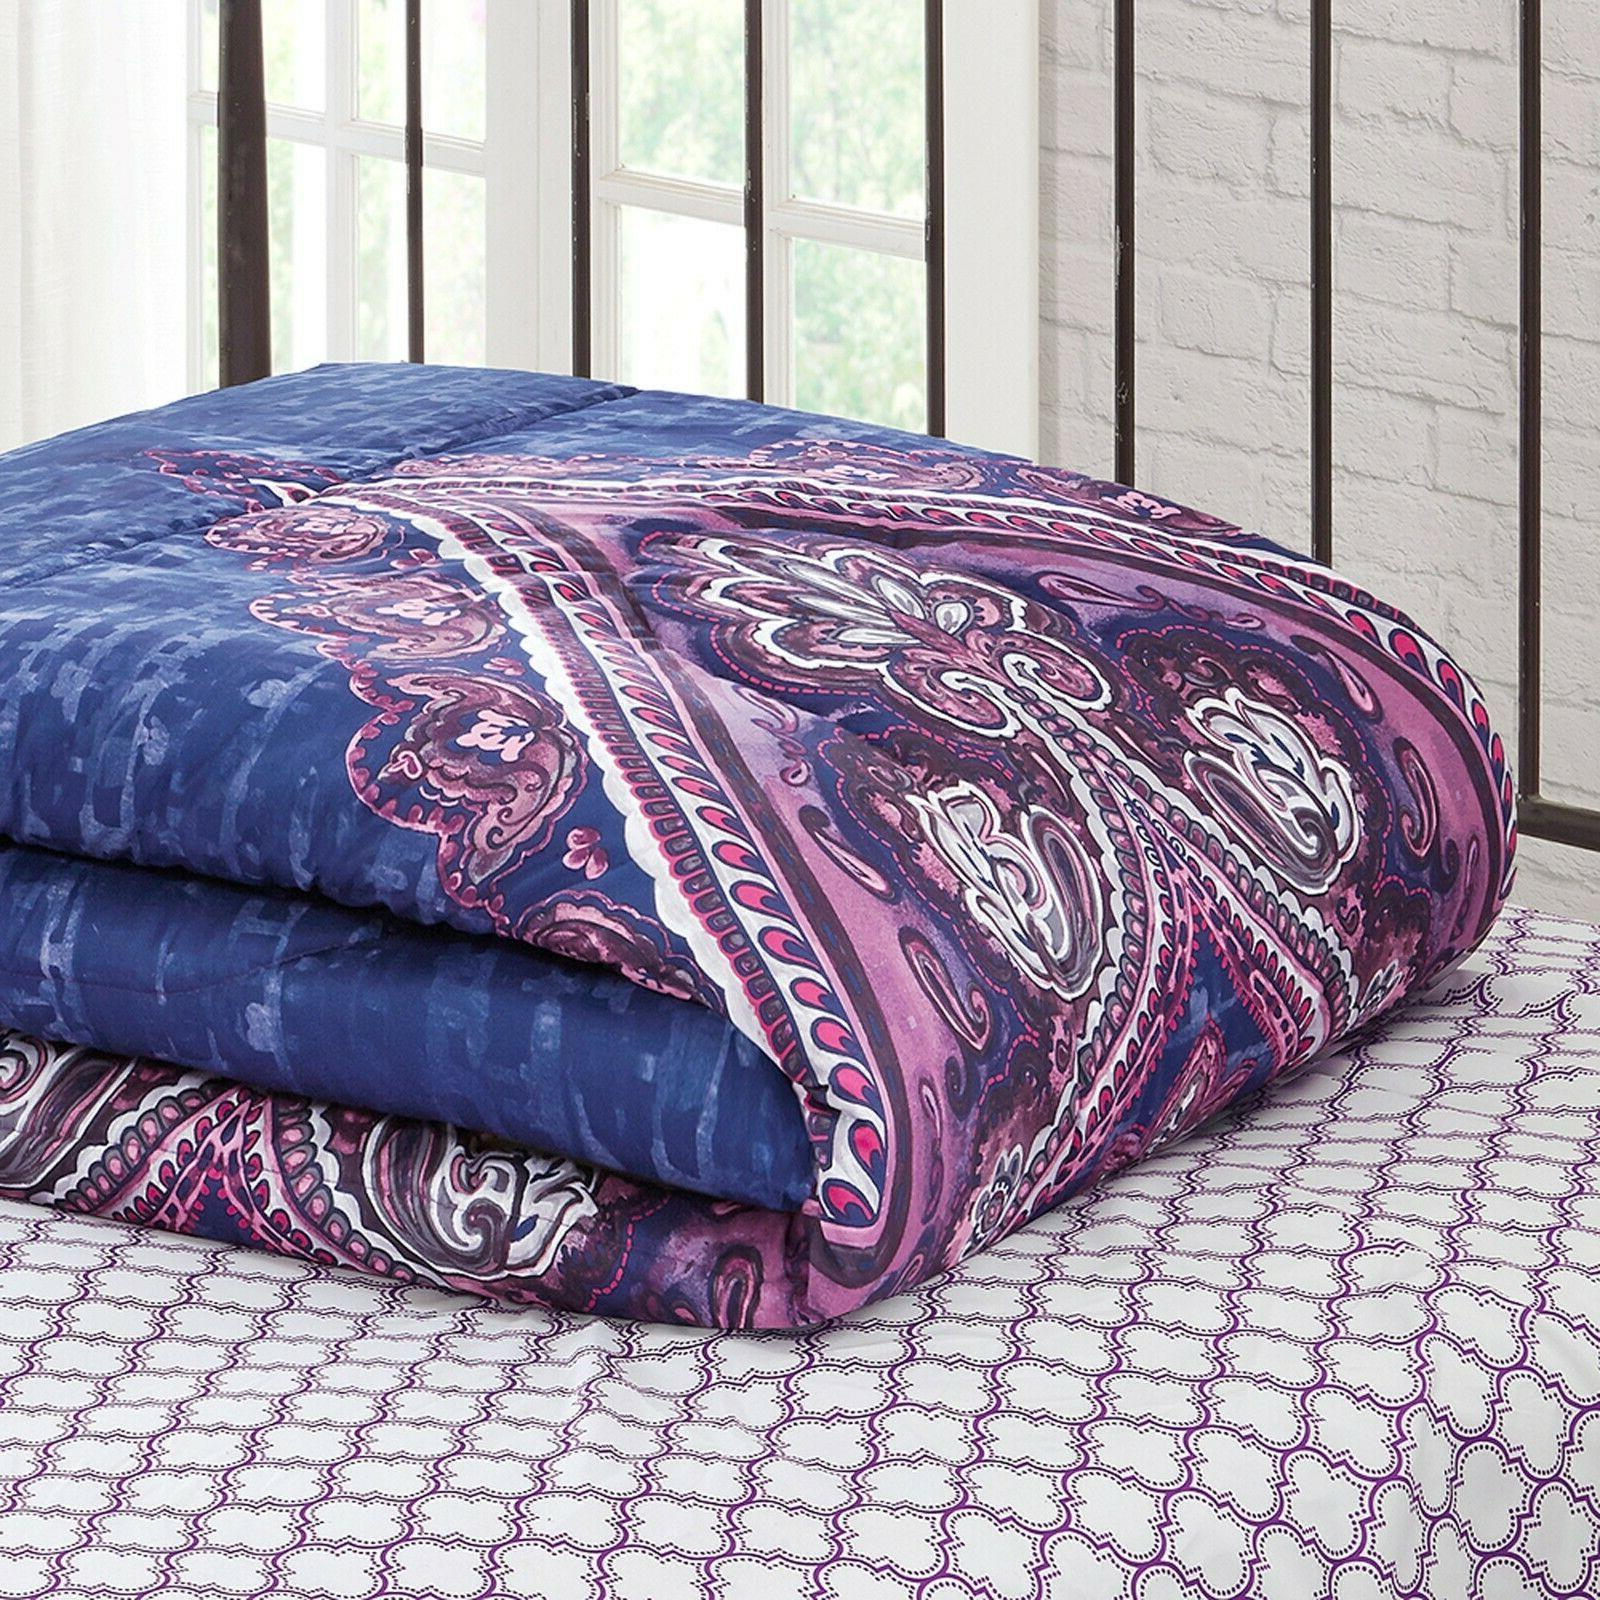 King Size Set Sham 8 Comfort Purple